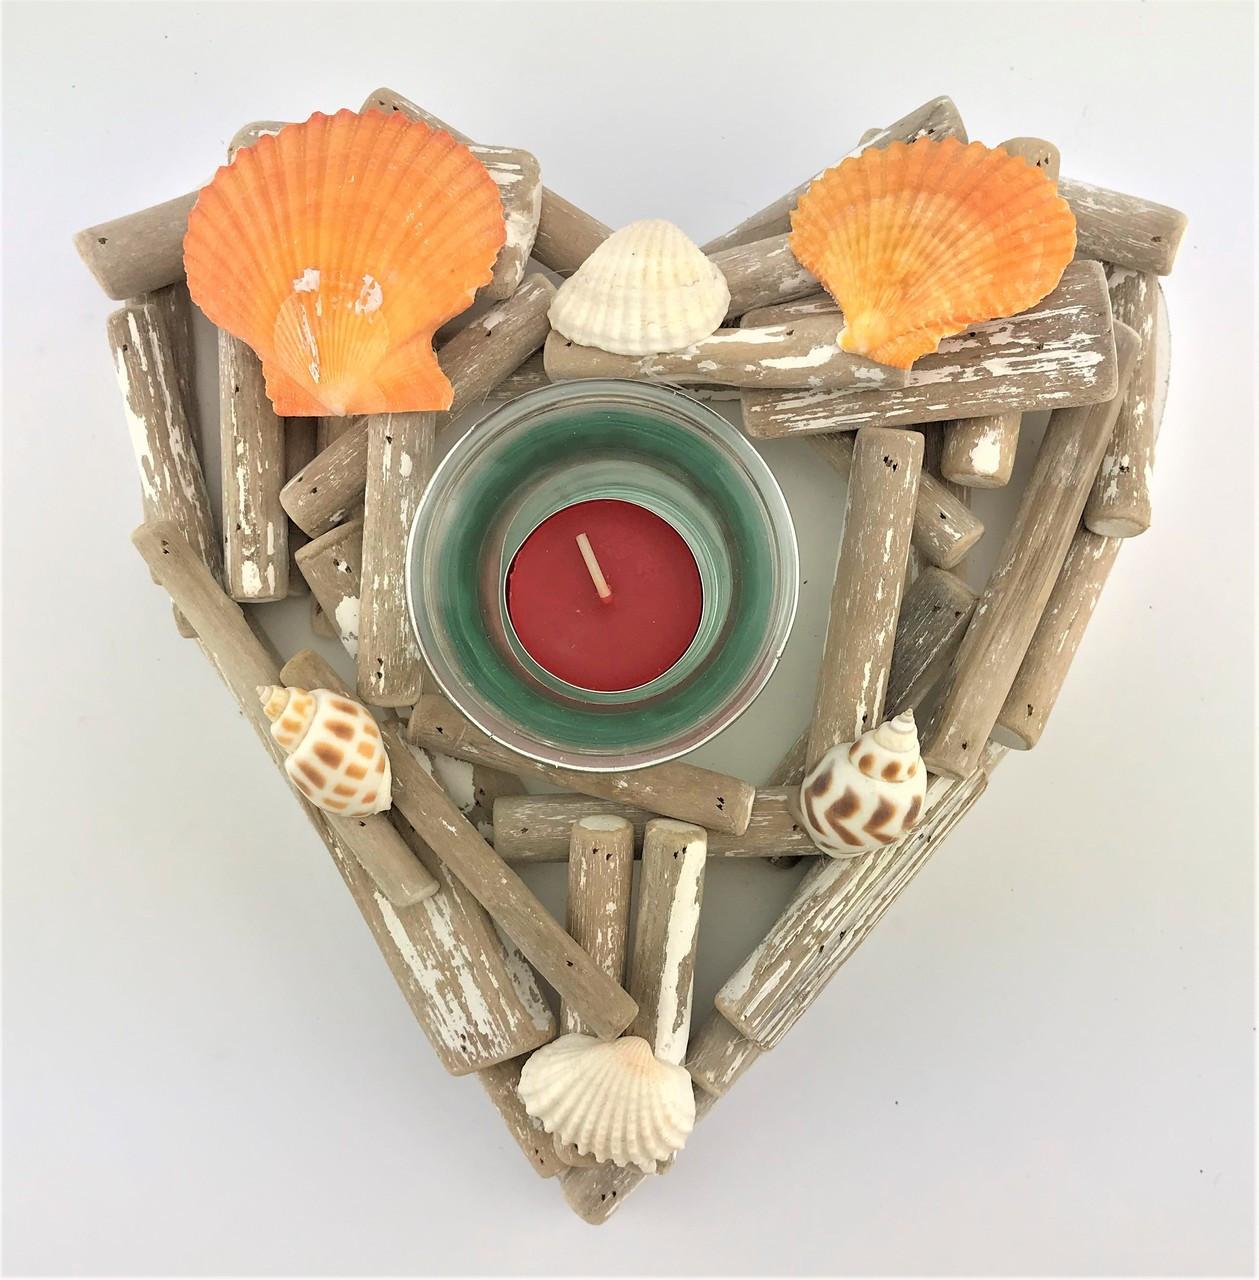 SINGLE CANDLE HOLDER HEART - DRIFTWOOD 15CM